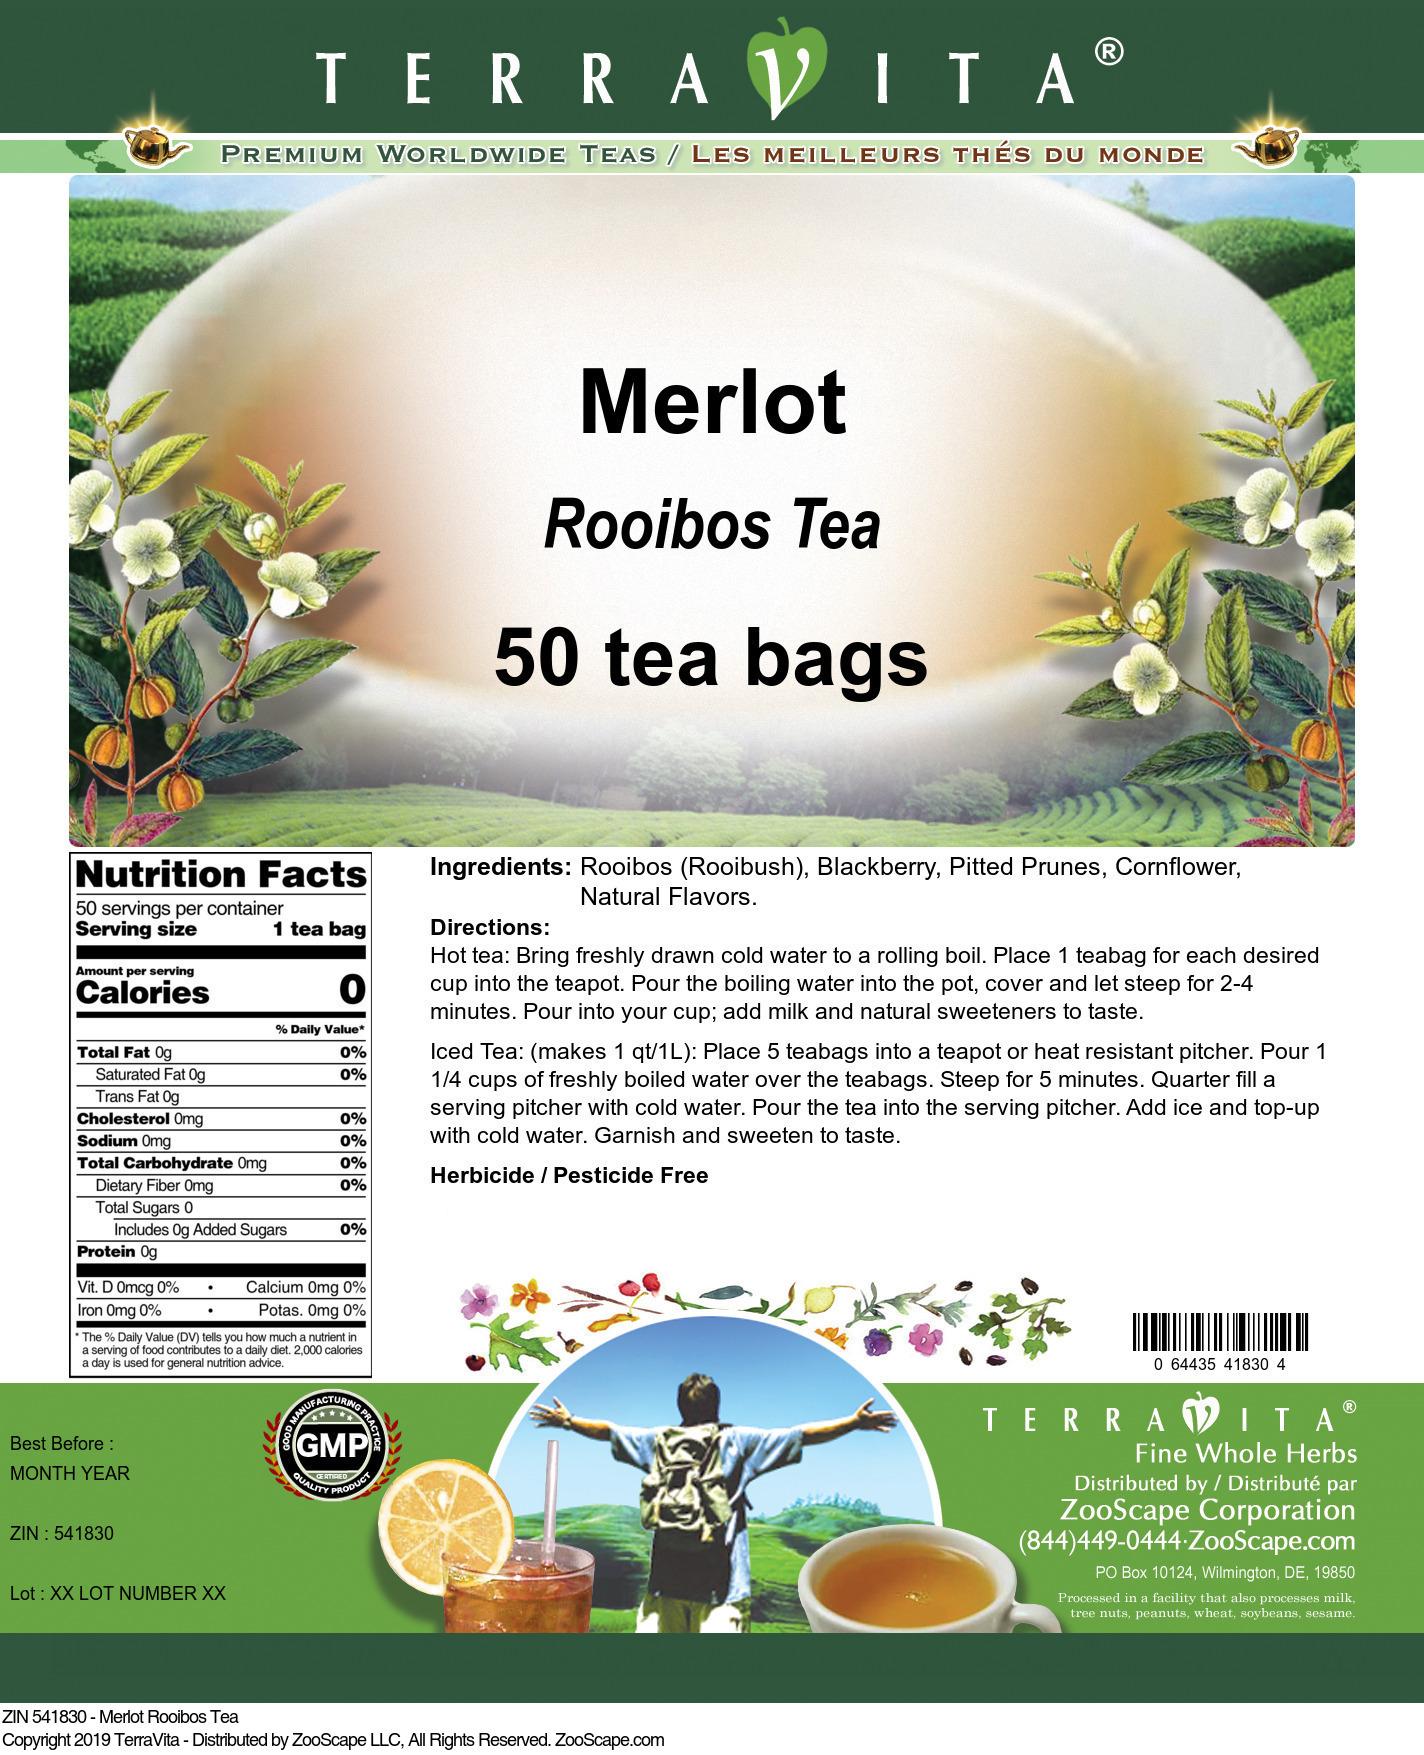 Merlot Rooibos Tea